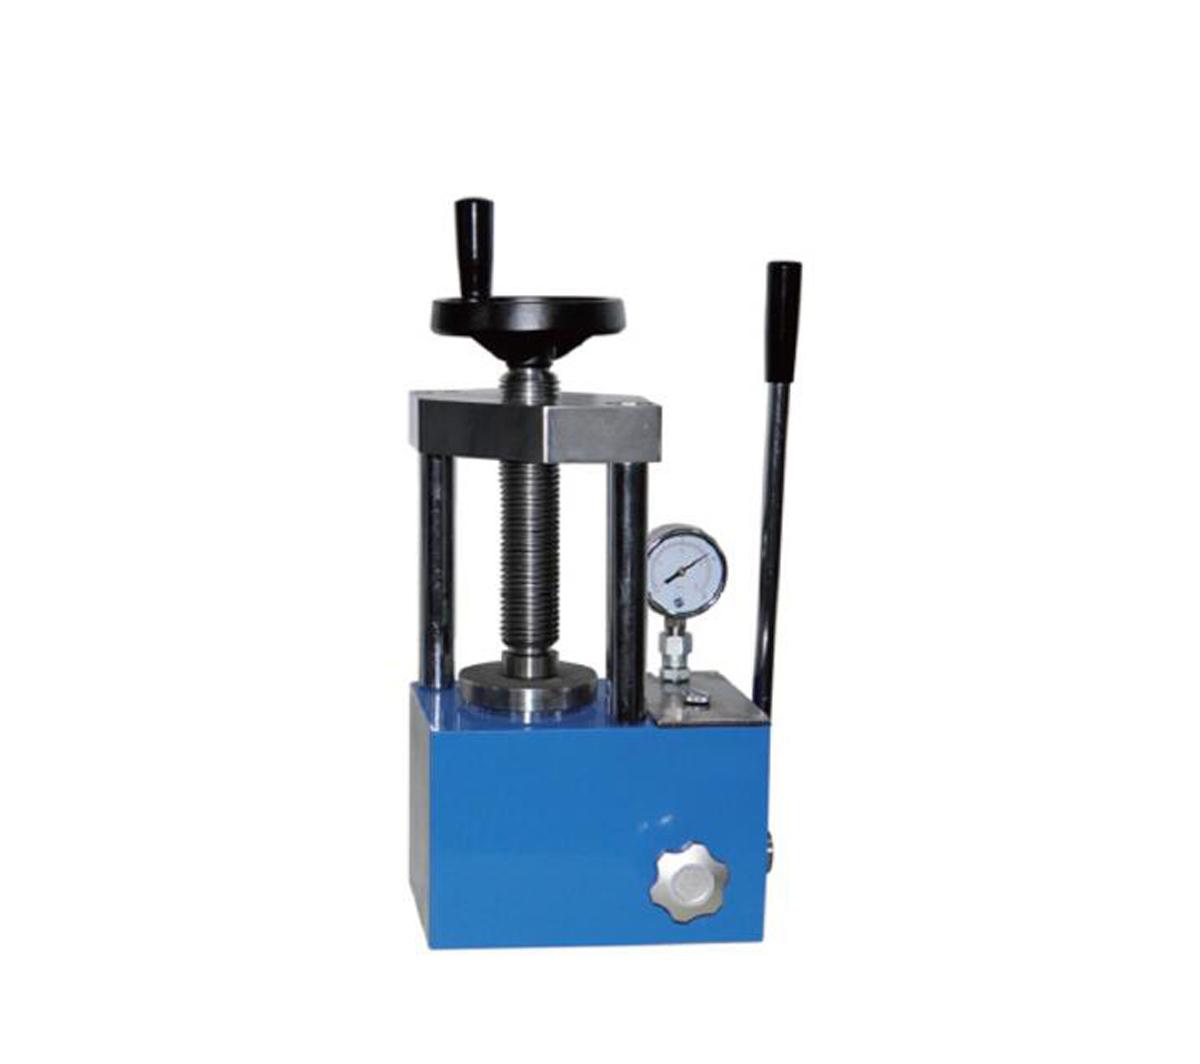 Laboratory compact 5 Tons hydraulic press